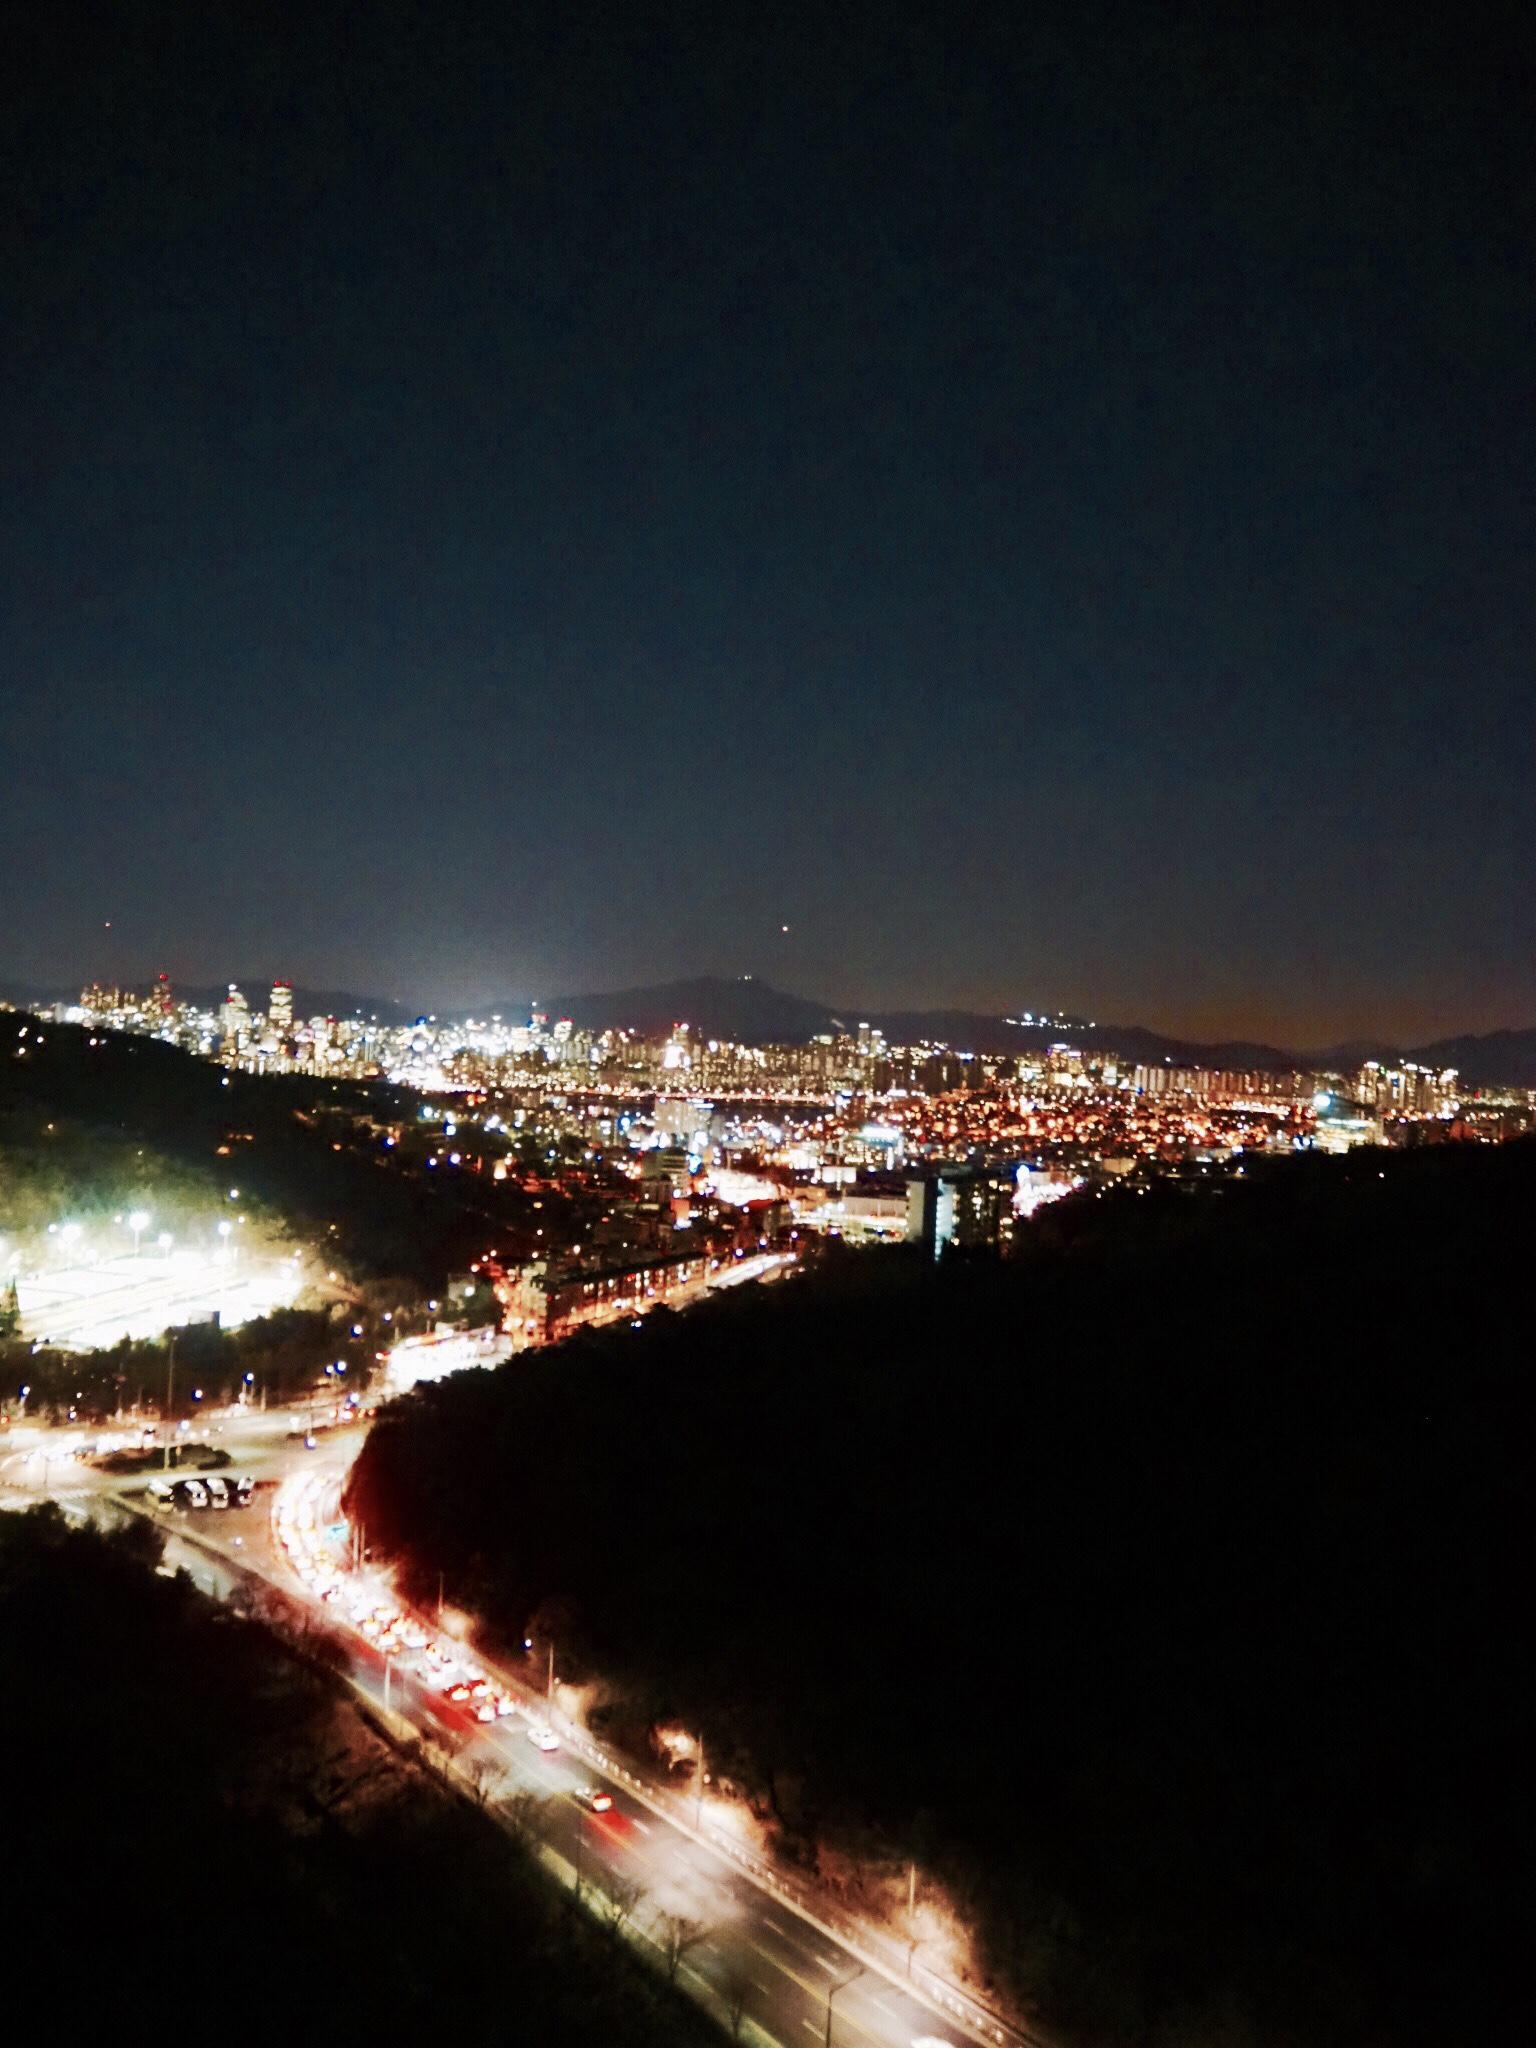 img 7928 - Banyan Tree Club & Spa Seoul - リピーターにお勧めしたい韓国ソウルのちょっと贅沢なステイ先